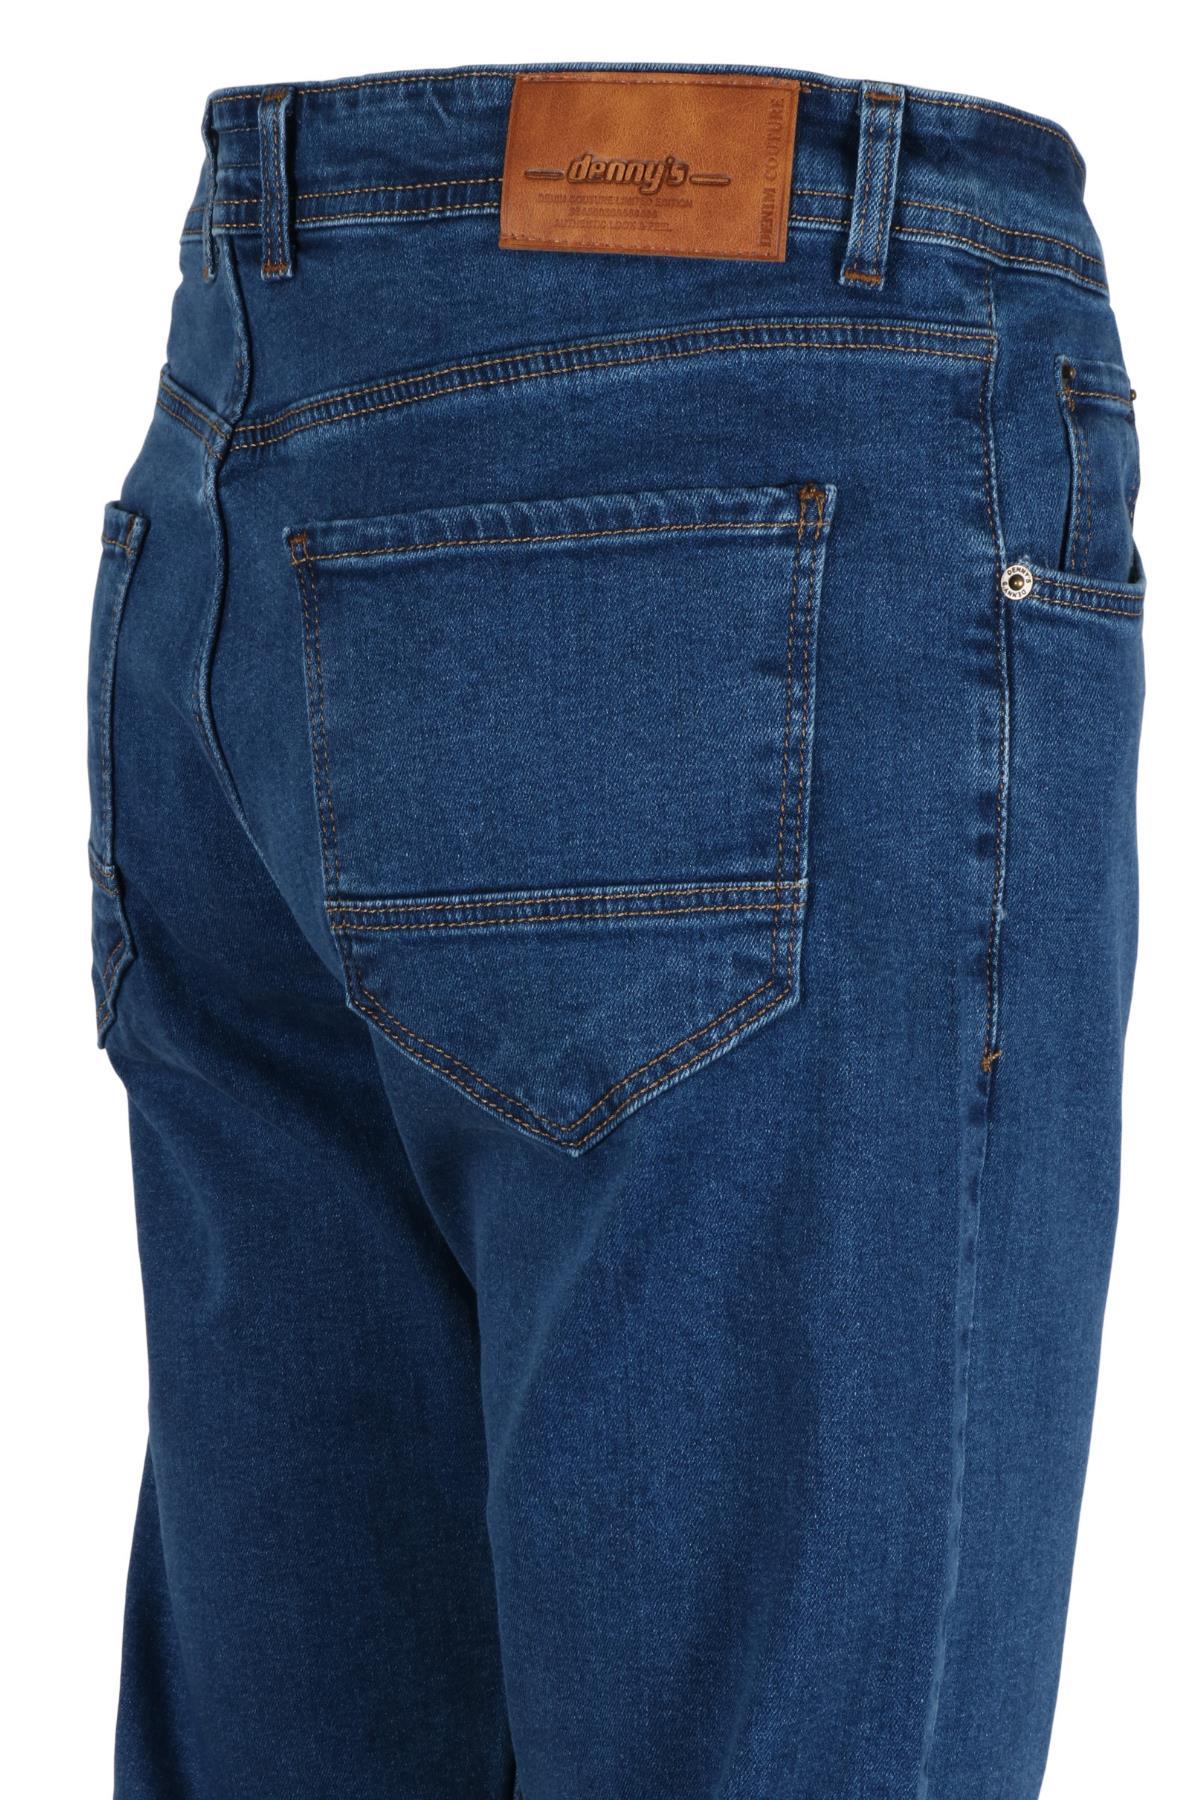 Erkek Battal Kot Pantolon Normal Kesim RAR00463